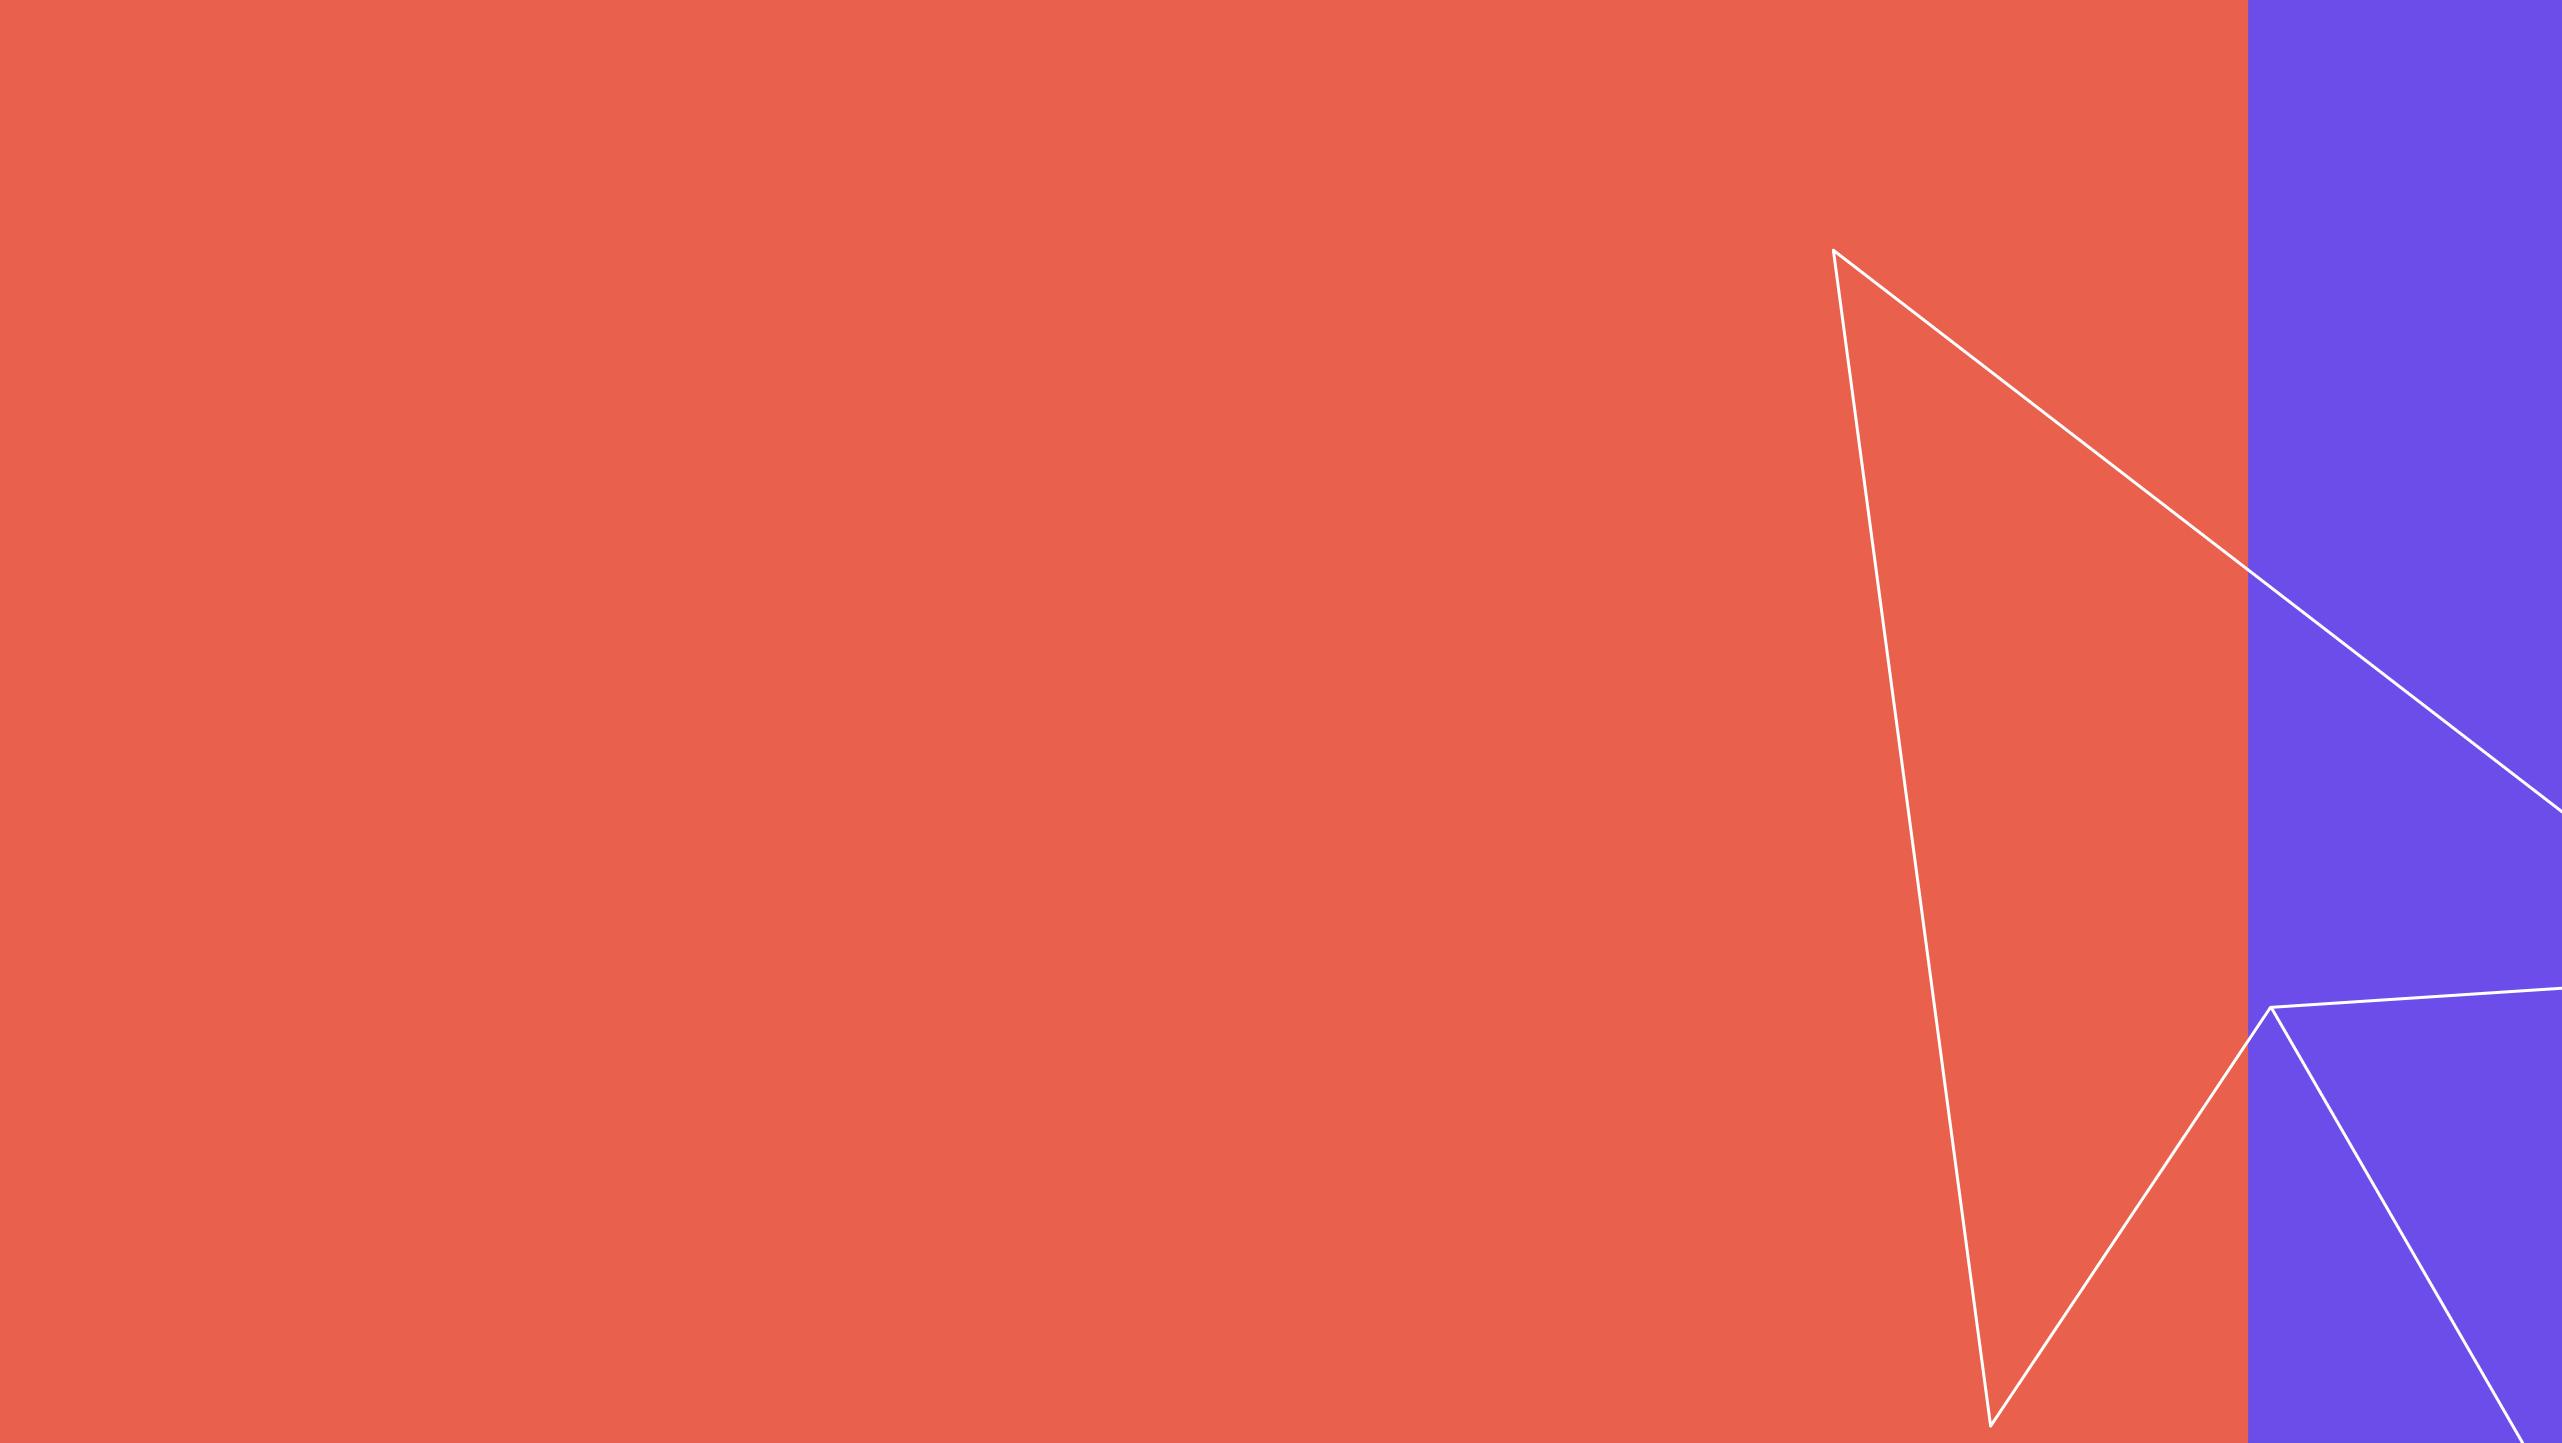 Design <br/> Resources